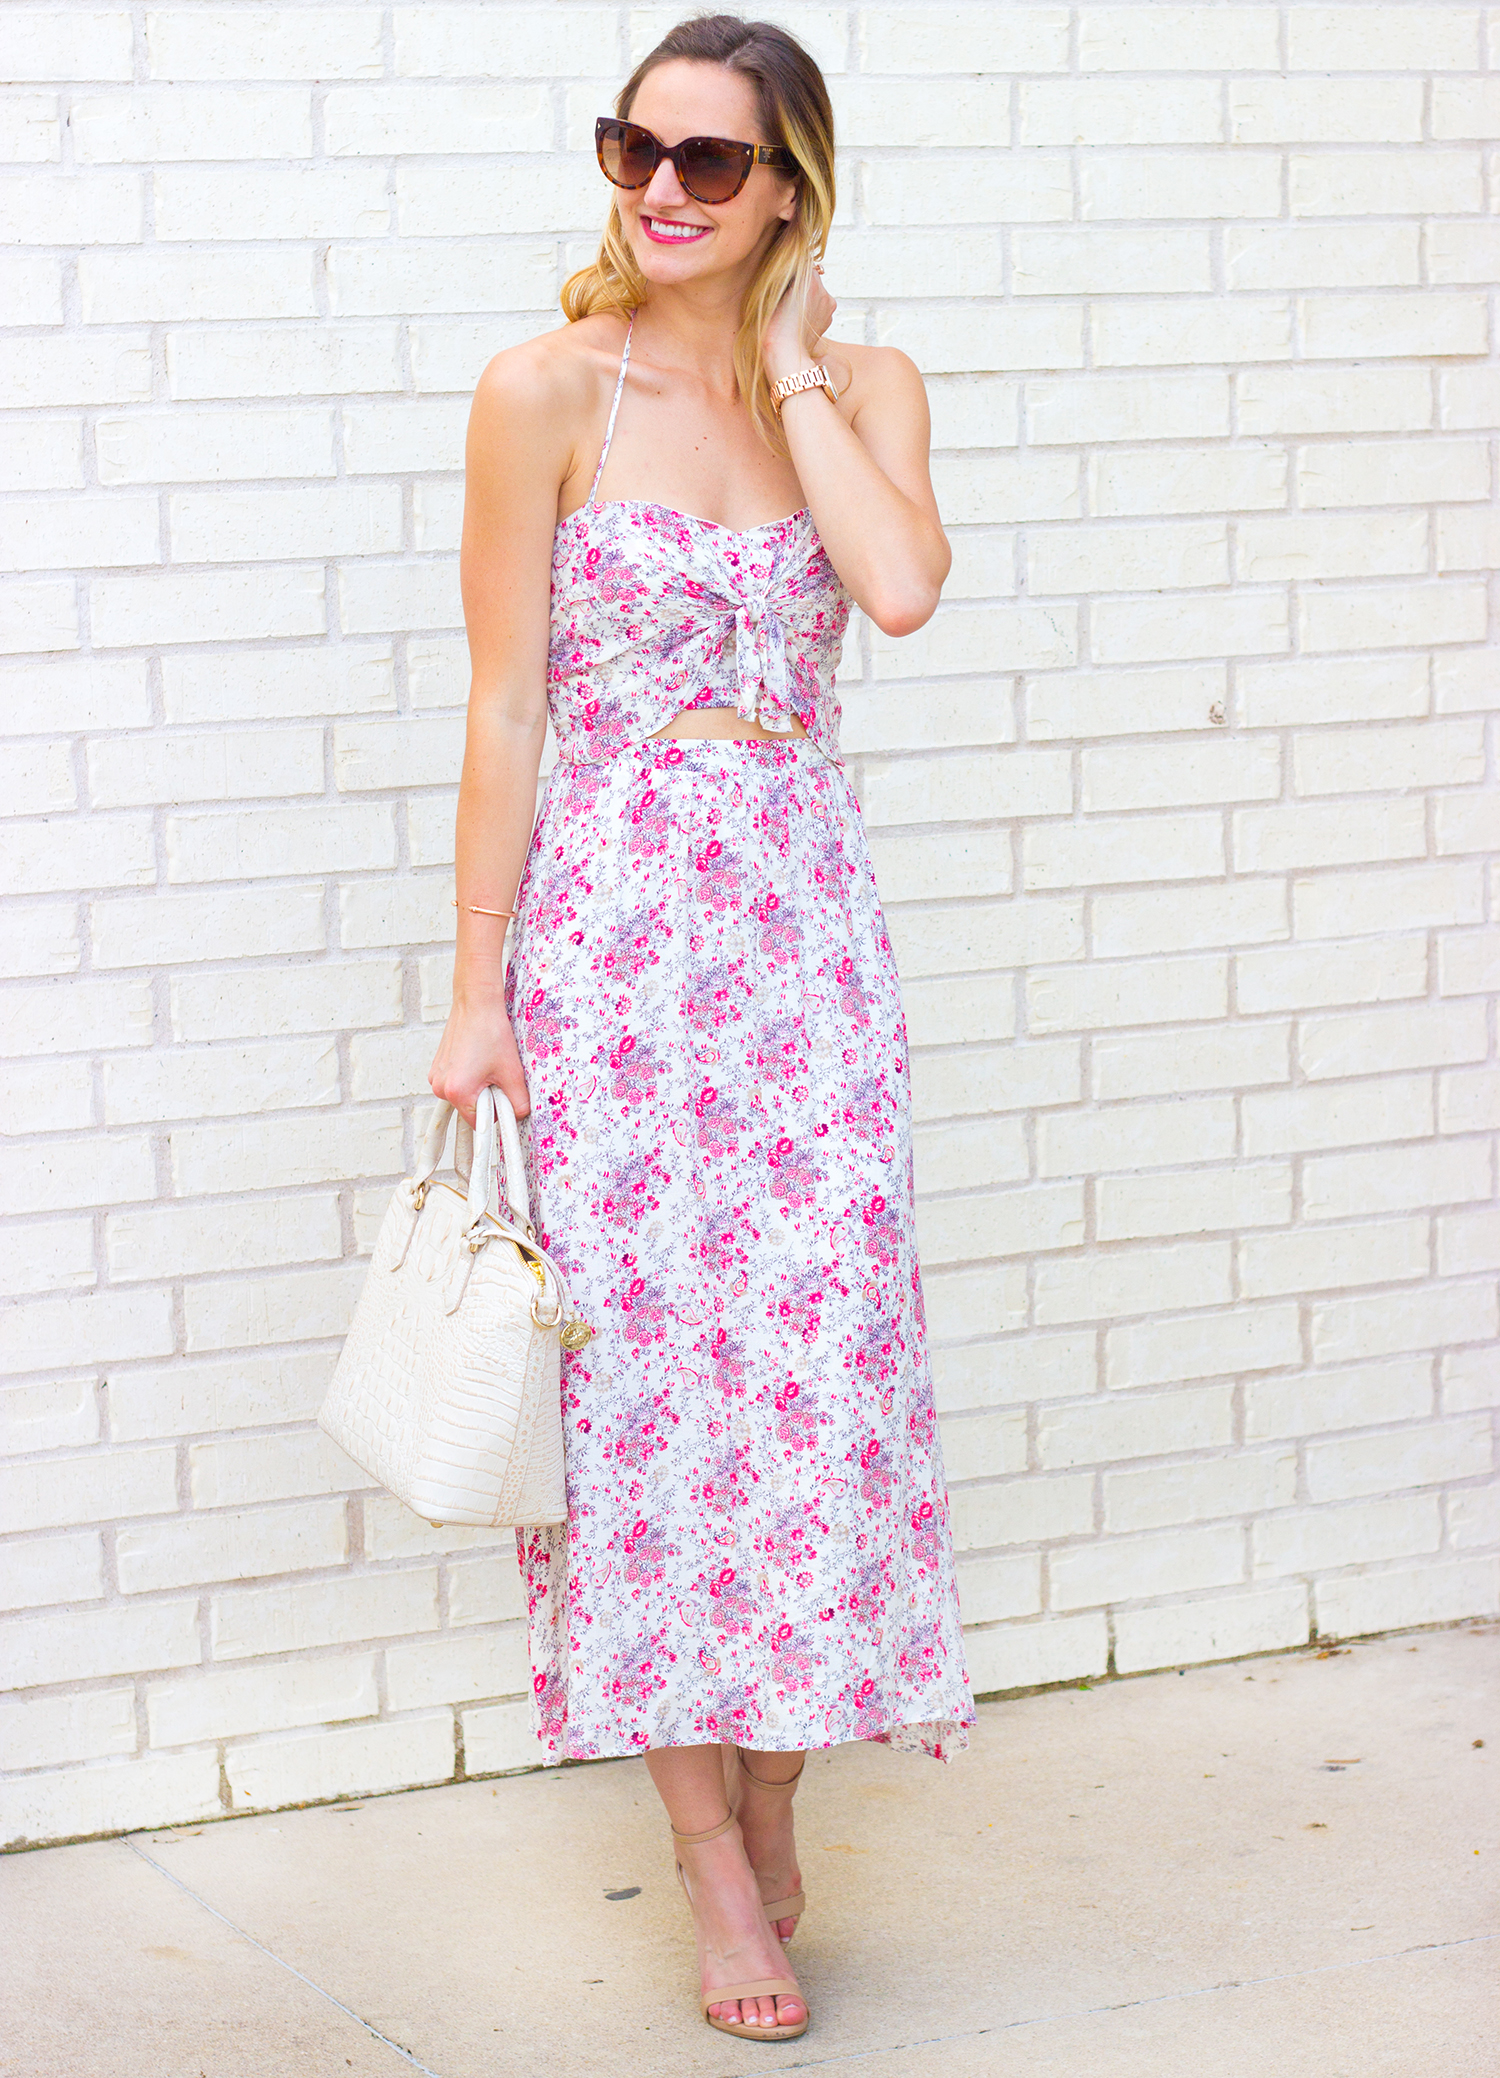 livvyland-blog-olivia-watson-austin-texas-fashion-blogger-astr-pink-floral-cutout-halter-sweetheart-maxi-dress-brahmin-duxbury-handbag-cava-6